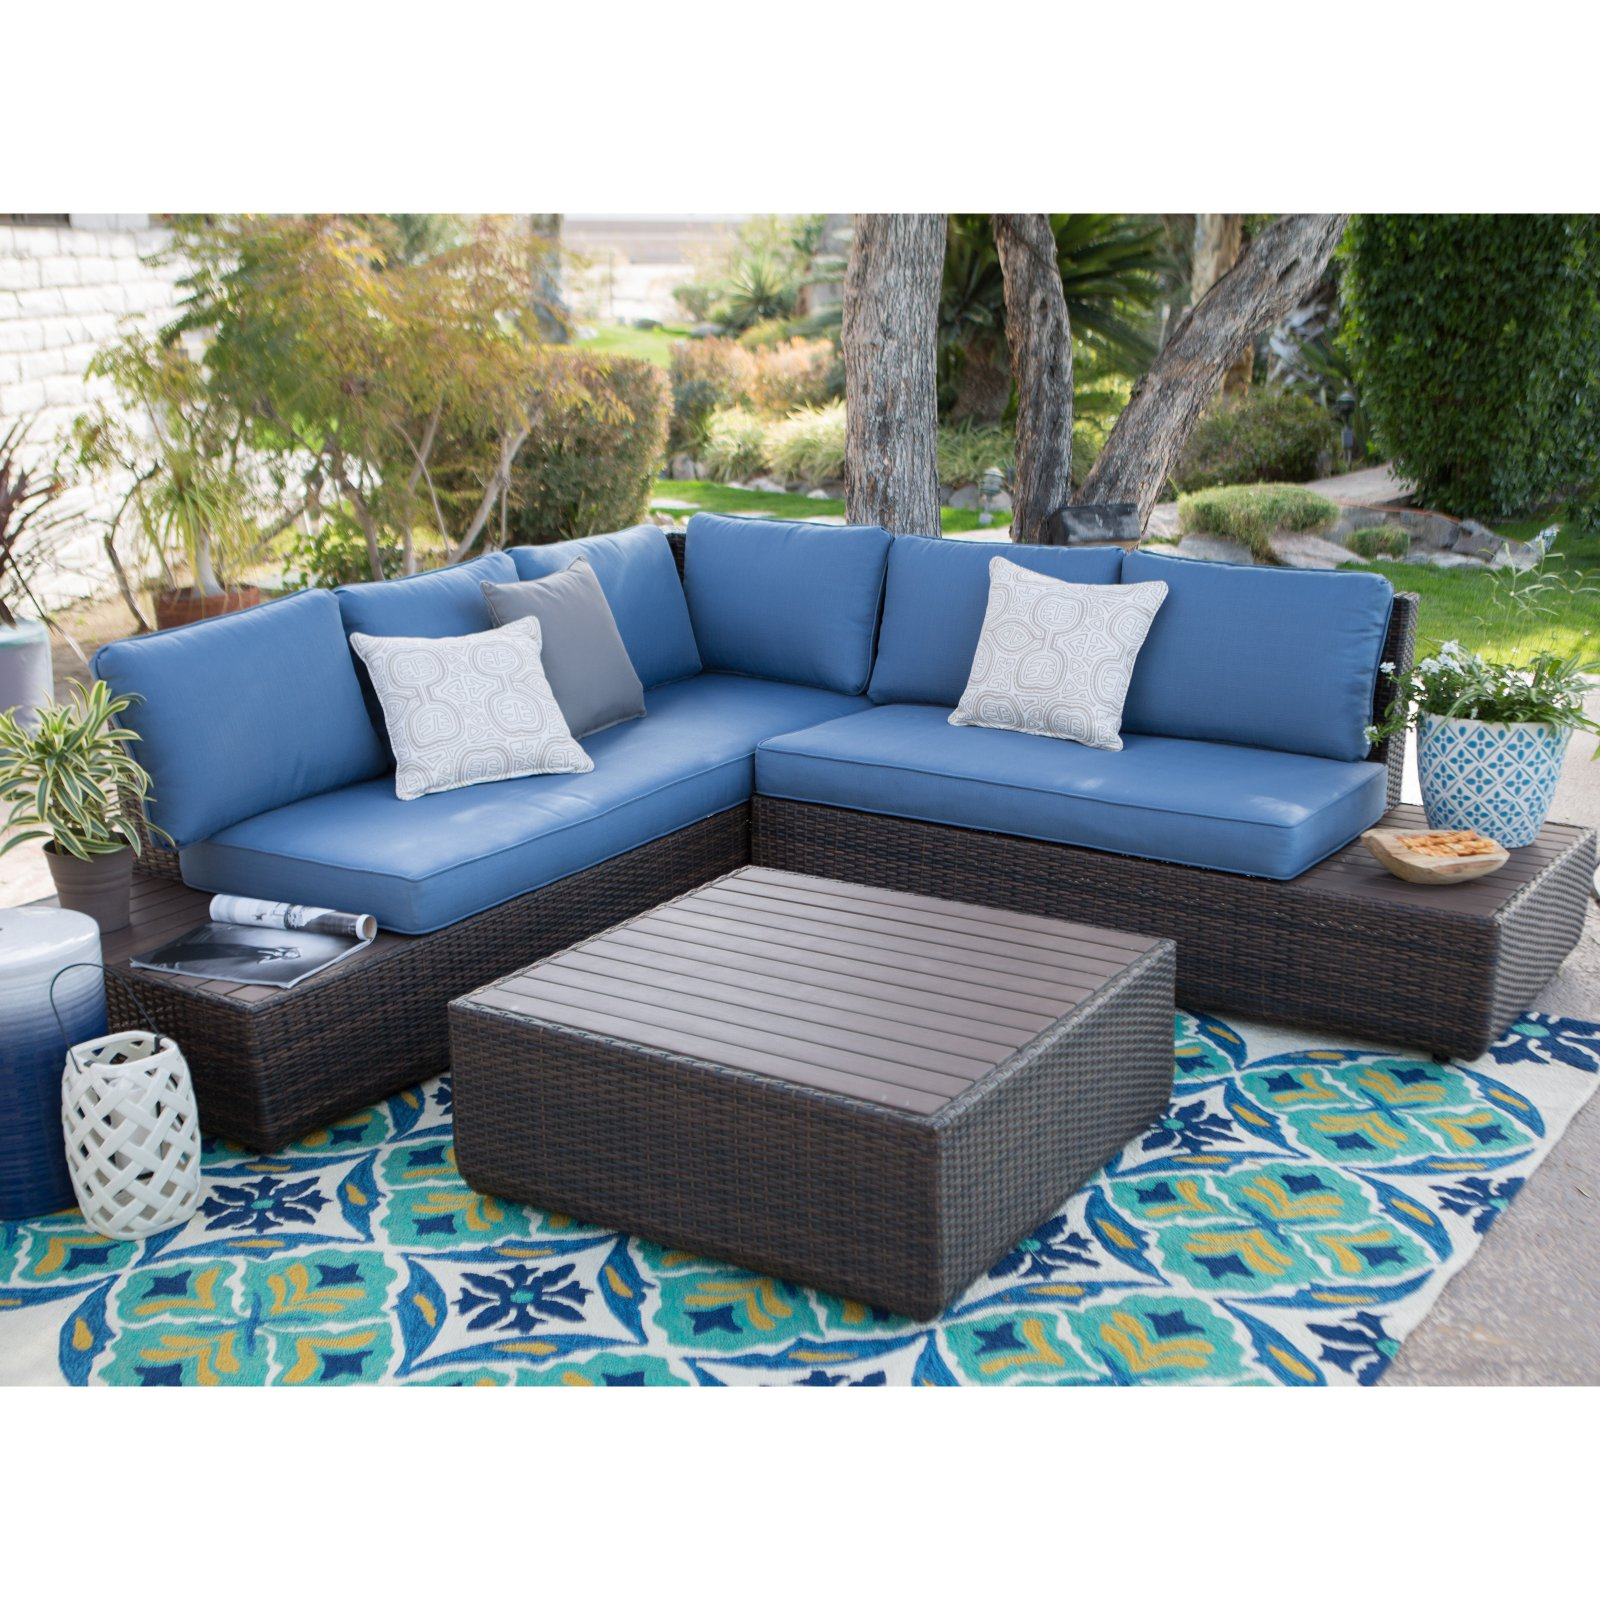 Favorite Belham Living Luciana Bay All Weather Wicker Loveseats With Cushions Regarding Wicker Loveseats (View 4 of 20)